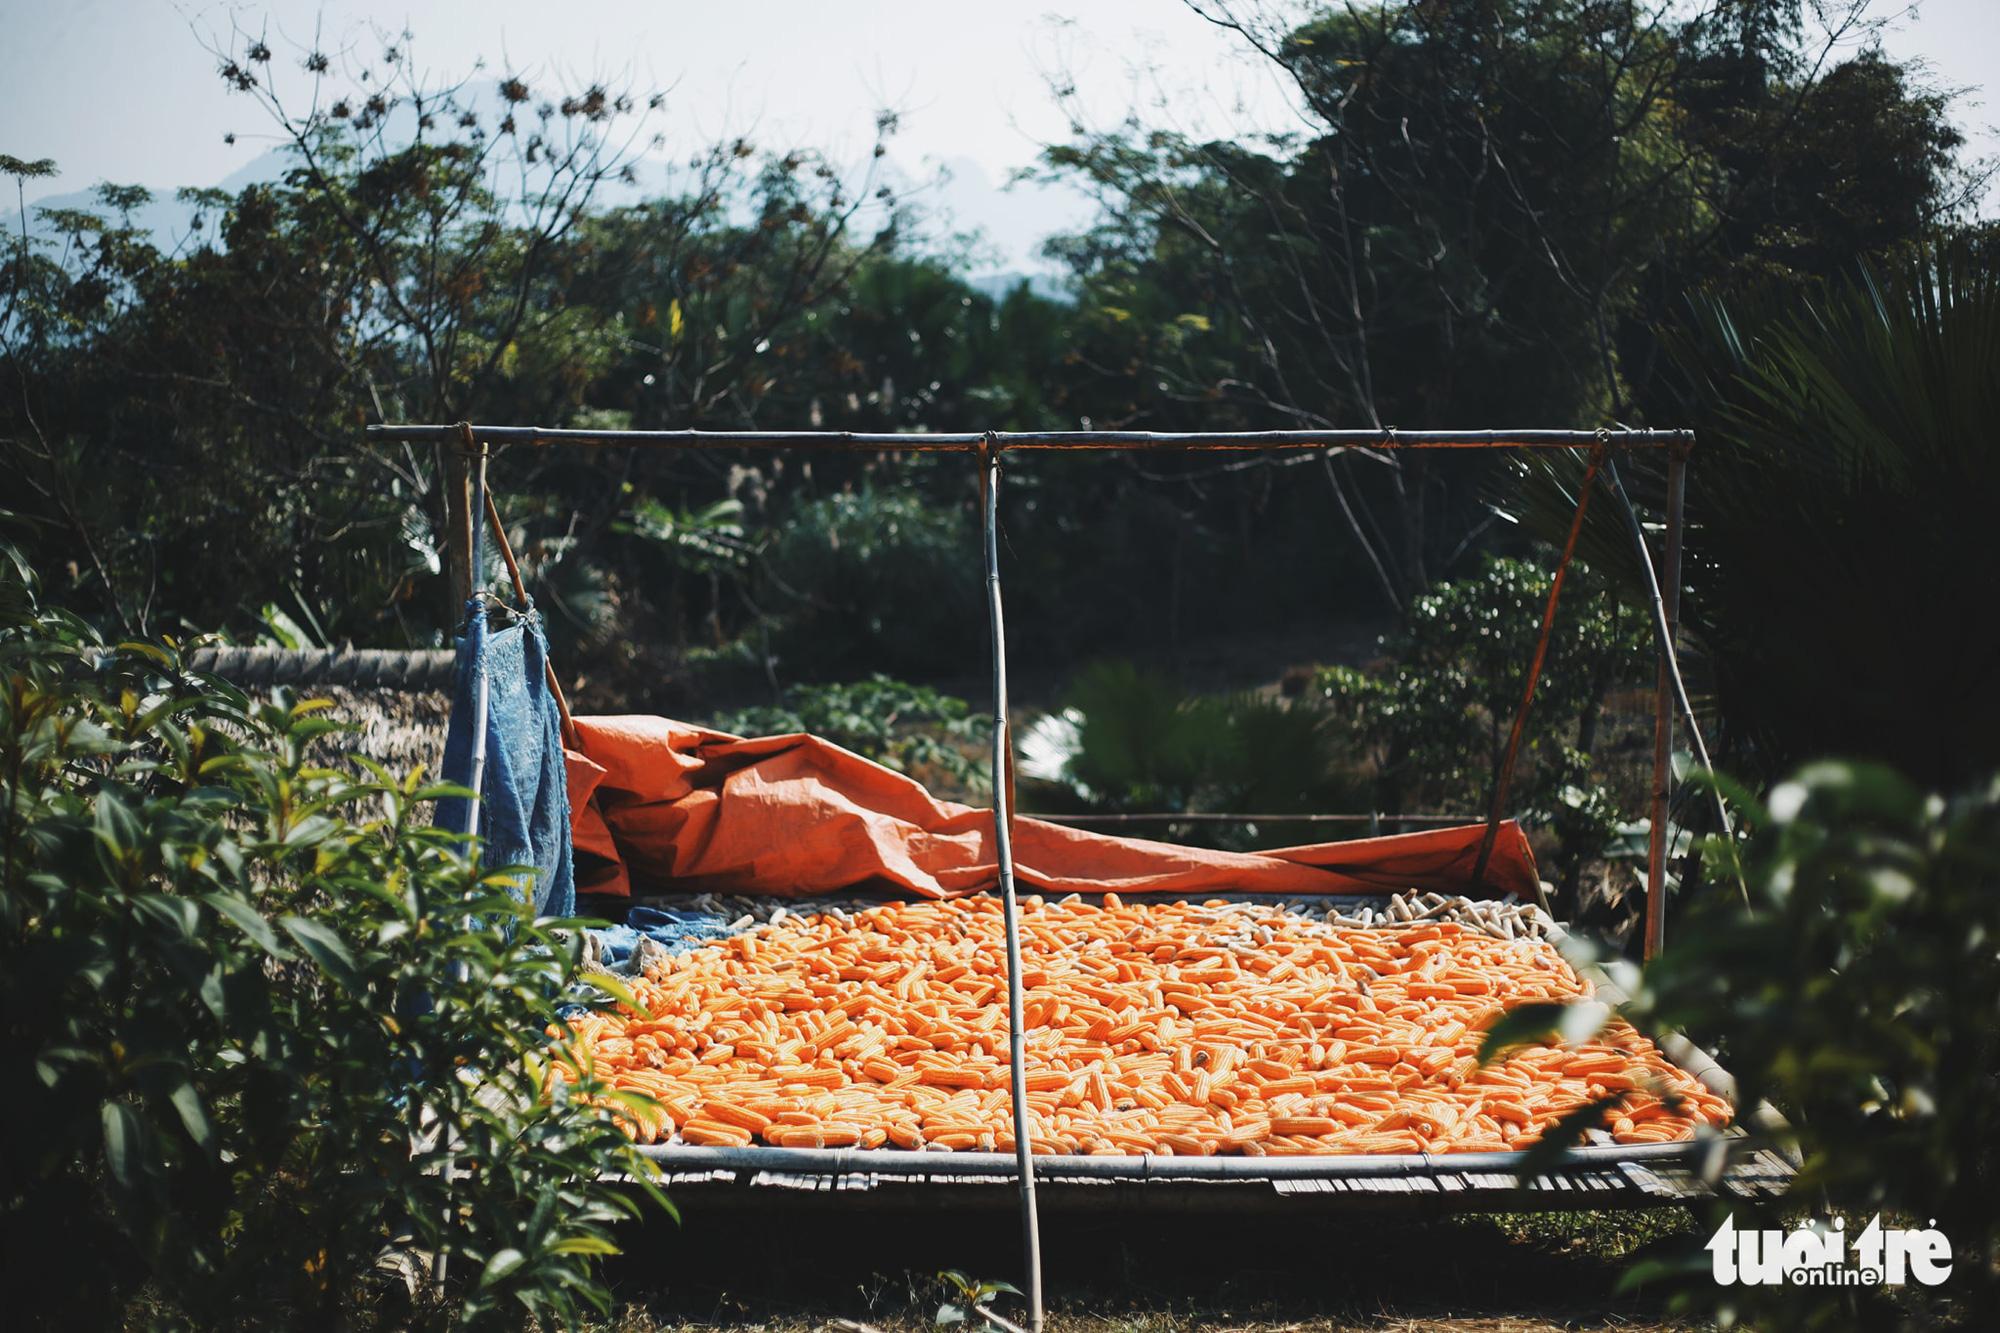 Harvested corn dries in the sun in Tong Pang Village, Lam Thuong Commune, Luc Yen District, Yen Bai Province, Vietnam. Photo: Mai Thuong / Tuoi Tre